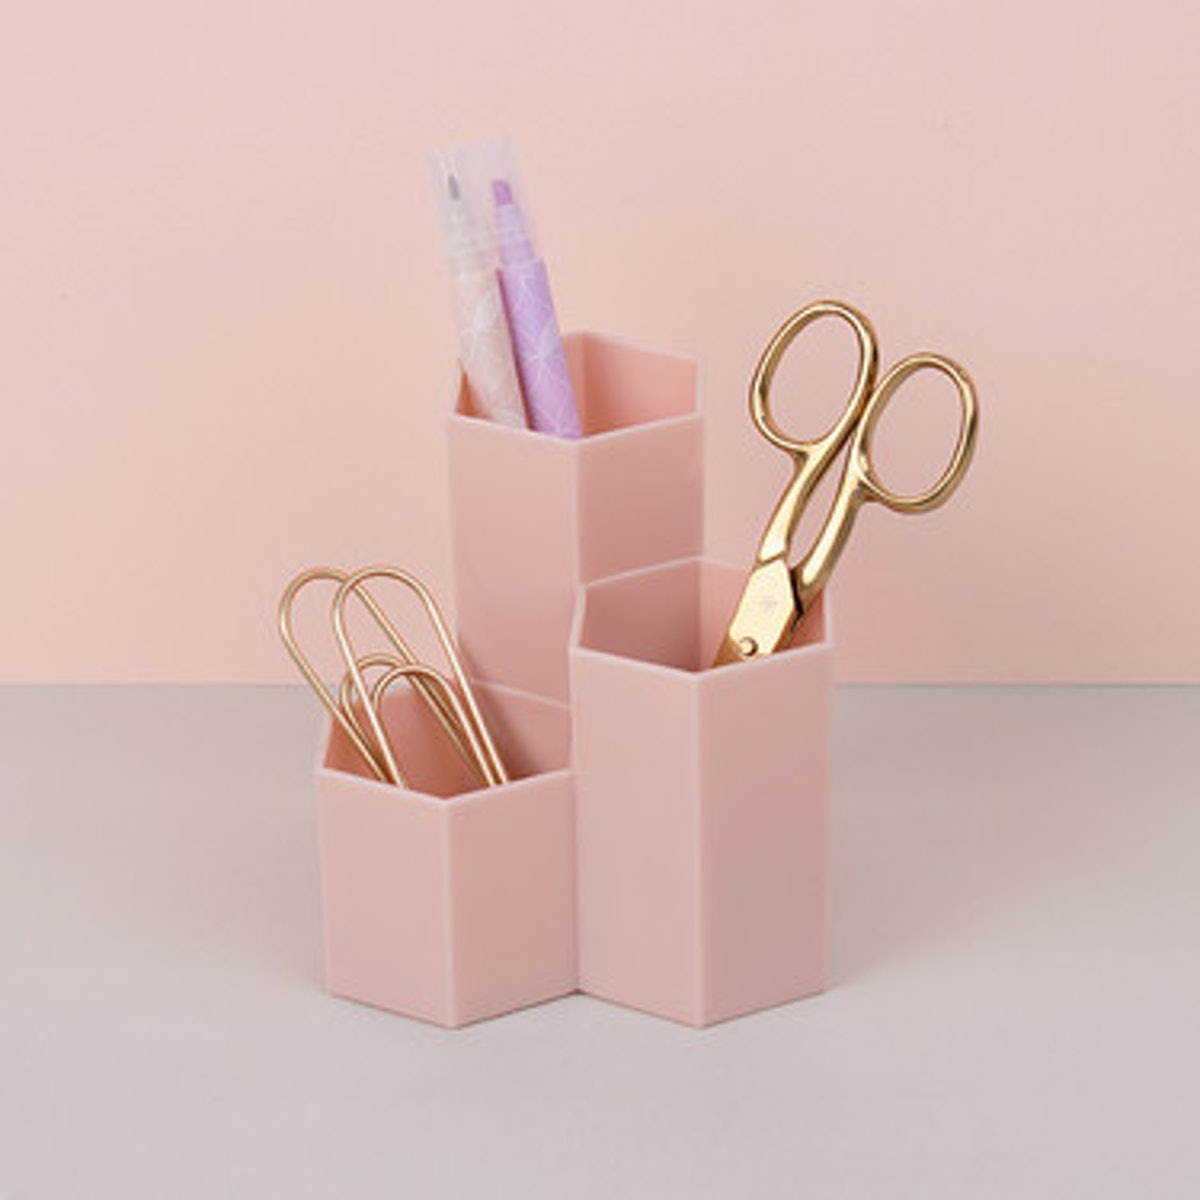 Blush Hexagon Pencil Holders